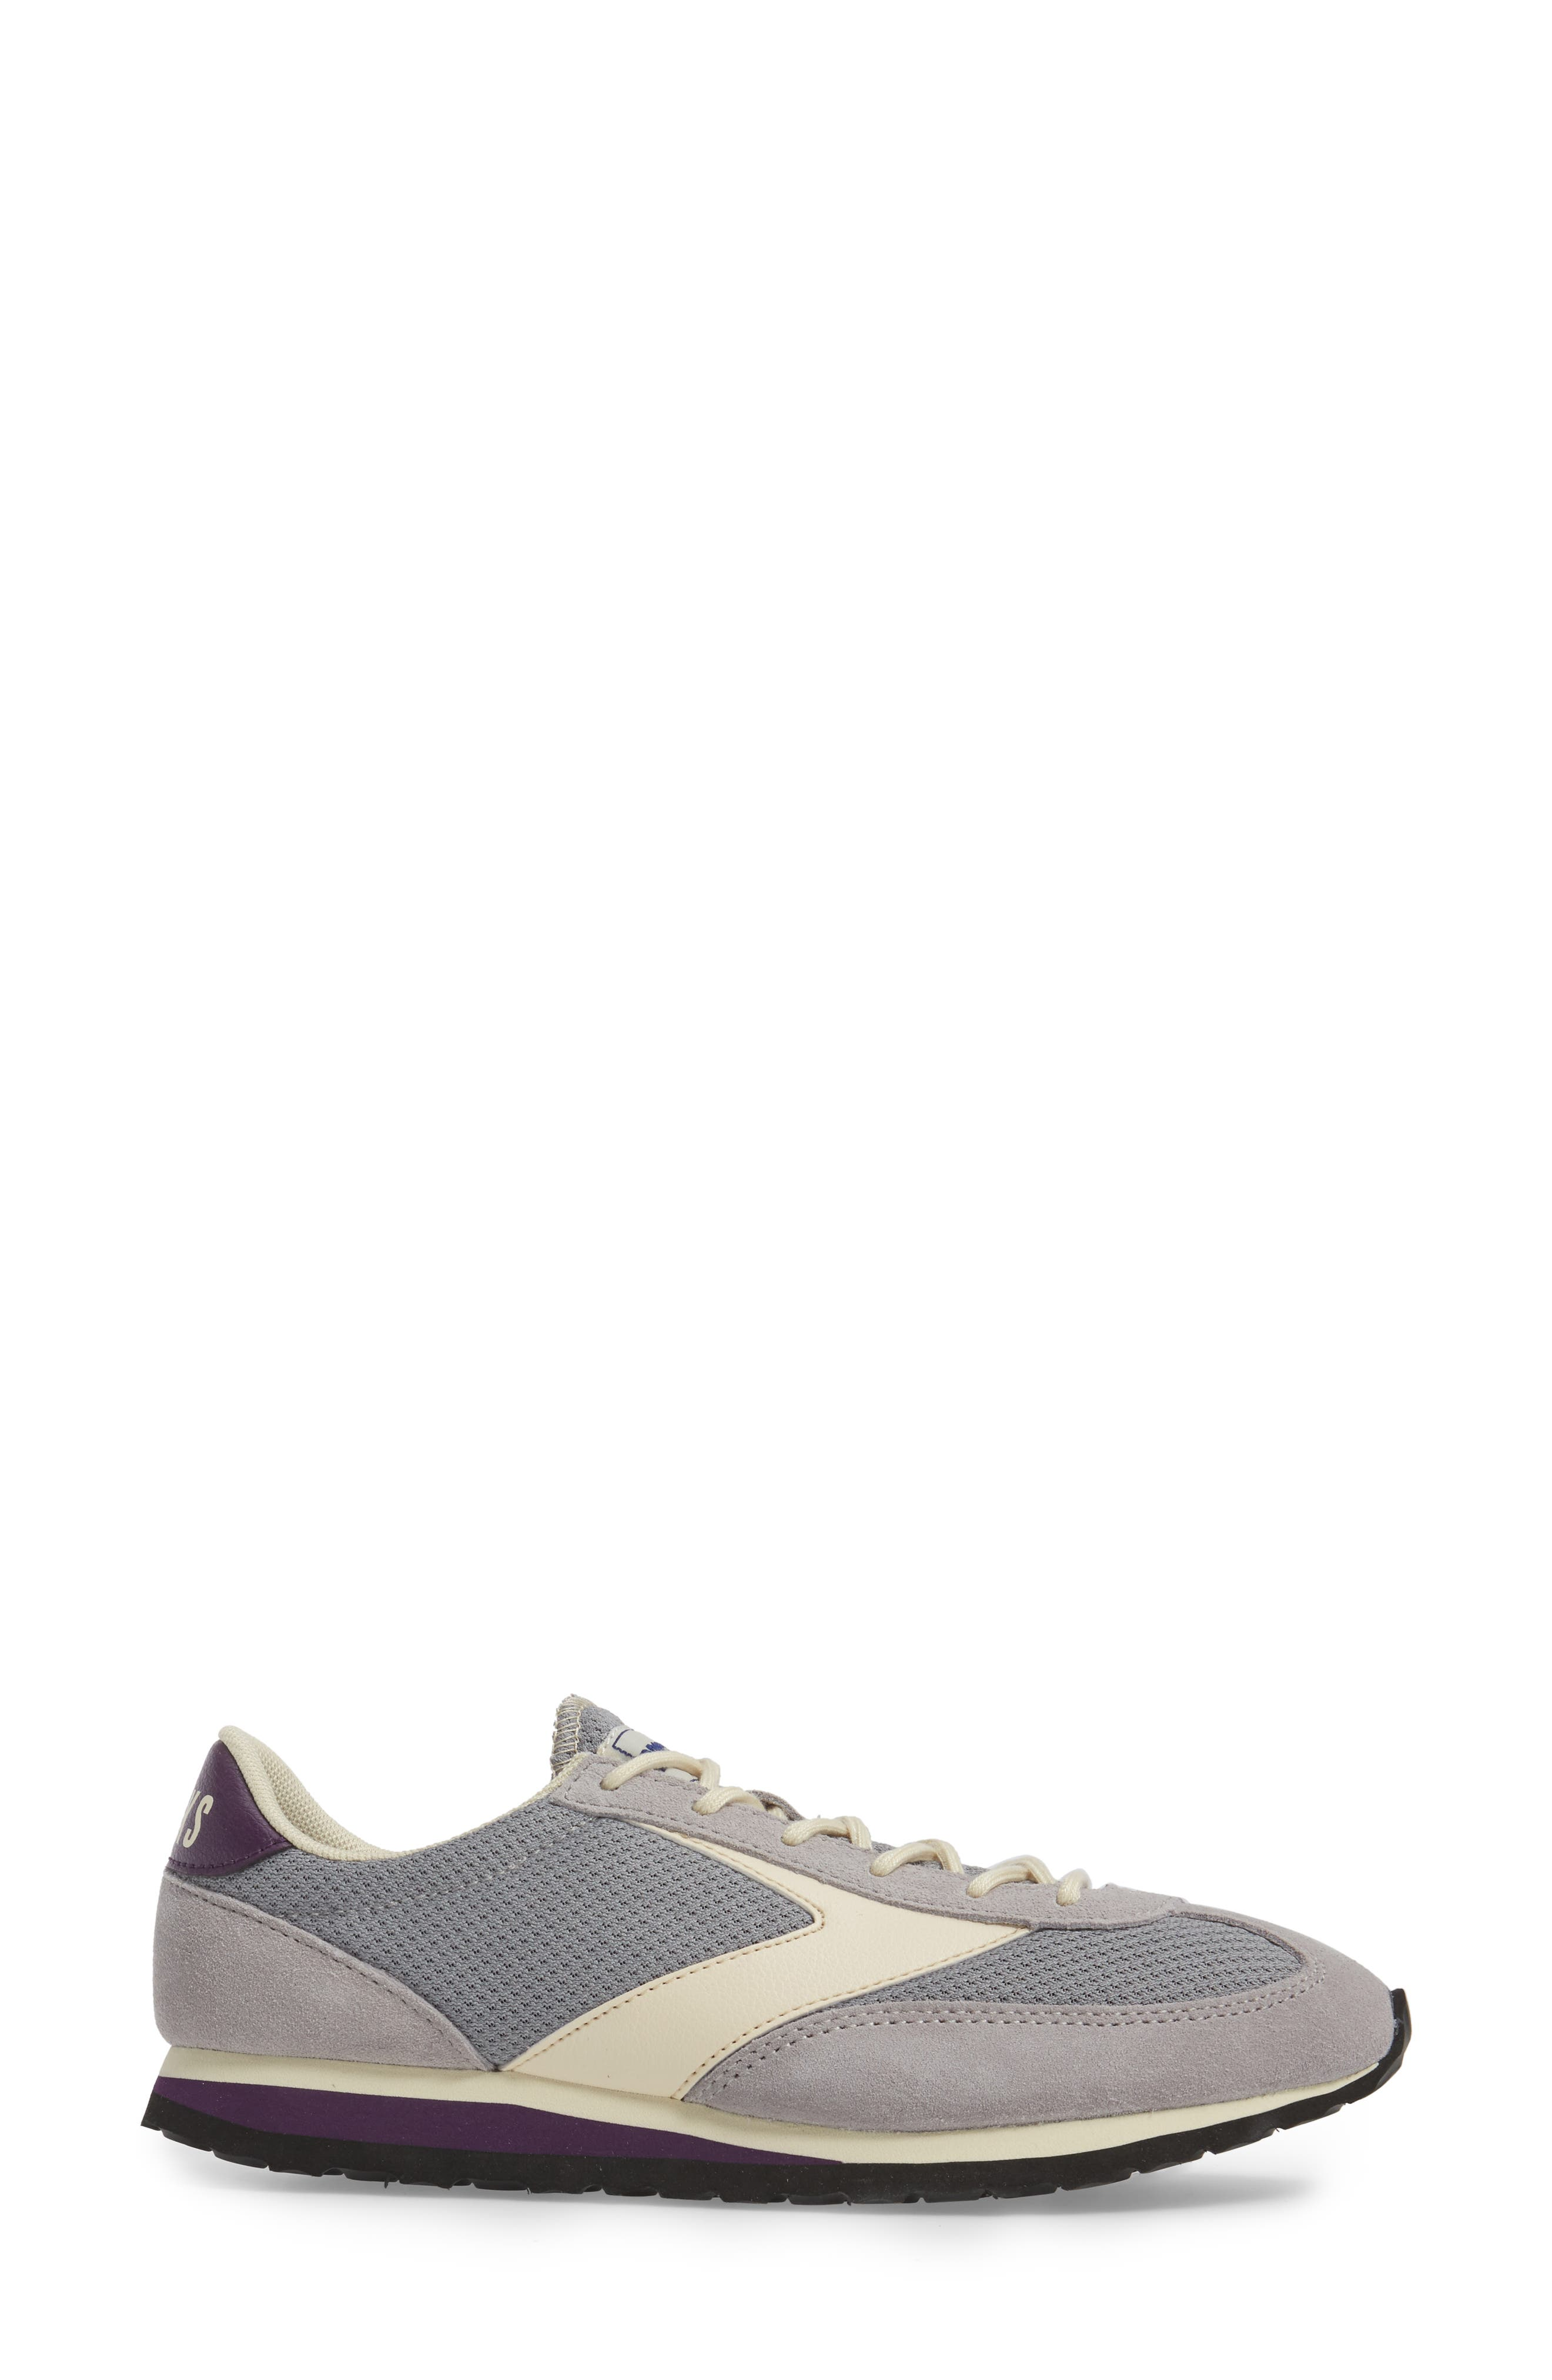 'Vanguard' Sneaker,                             Alternate thumbnail 104, color,